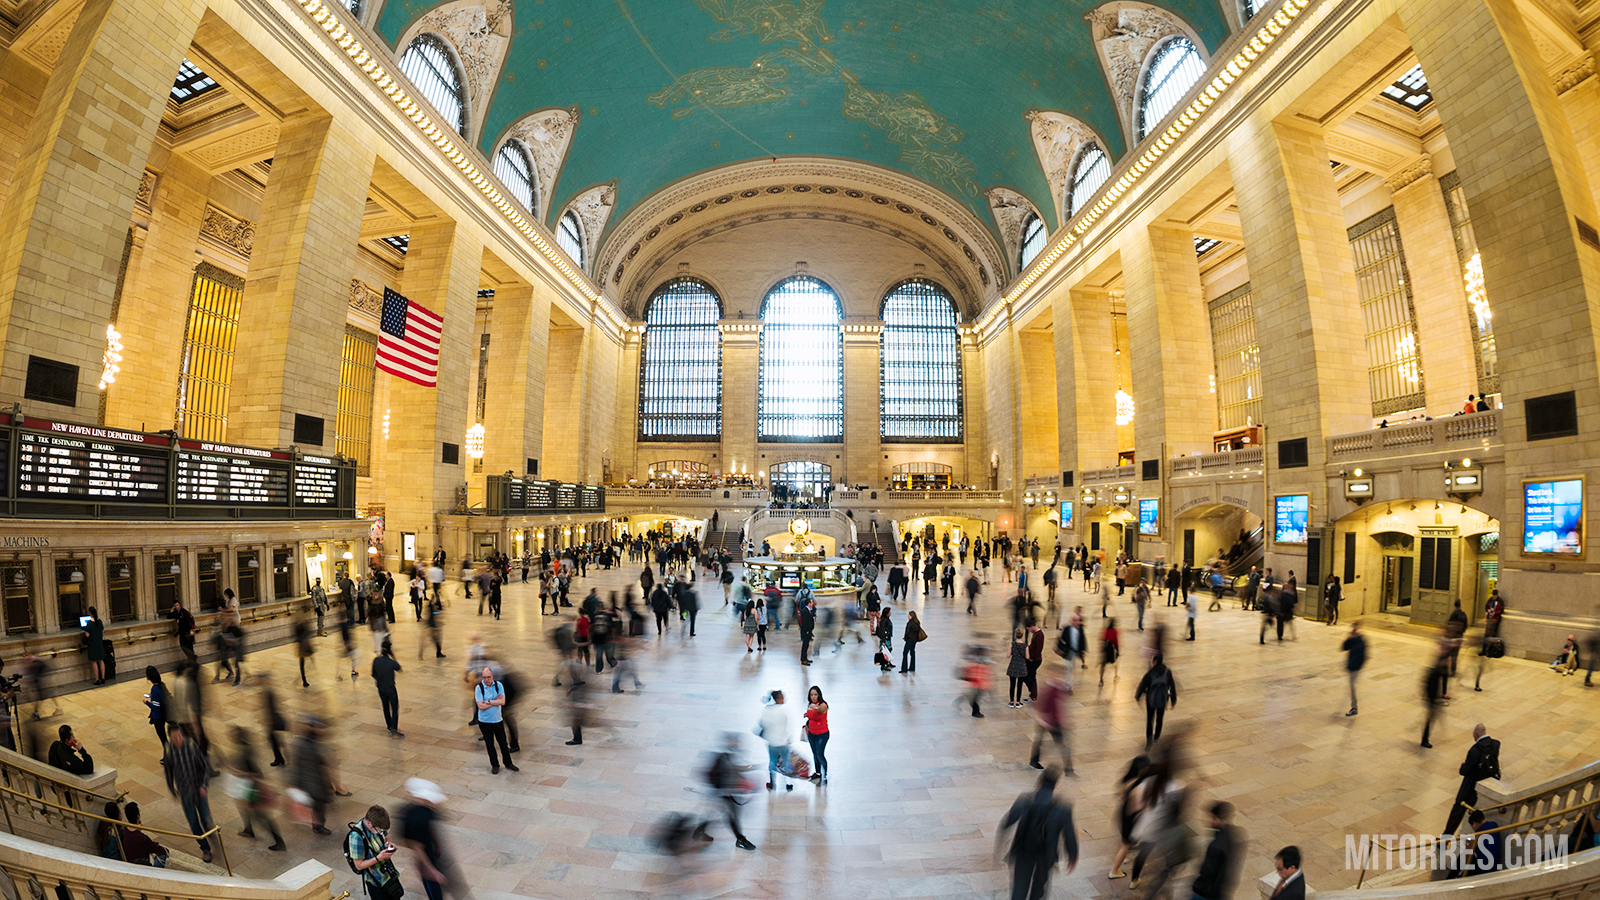 Grand Central Station, New York City. Photo: Marlon I. Torres